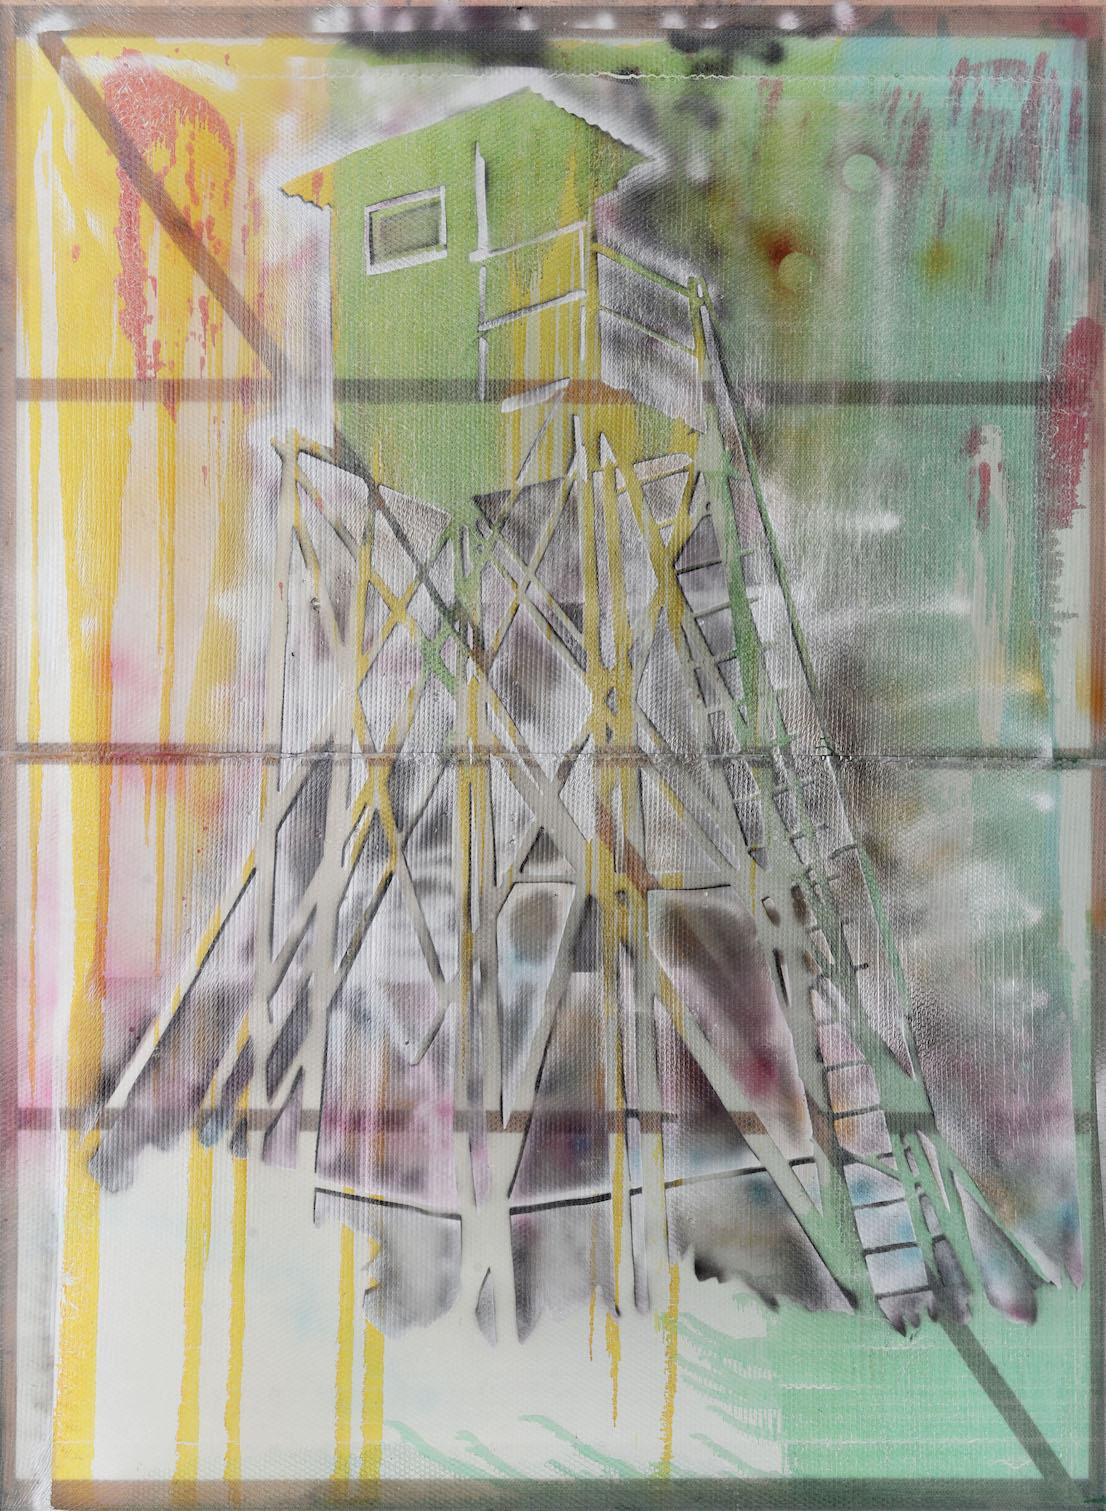 Sigmar Polke (1941 - 2010) Watchtower (Hochsitz)1984 IVAM, Institut Valencia d'Art Modern, Valencia, Spain © The Estate of Sigmar Polke / DACS, London / VG Bild-Kunst, Bonn